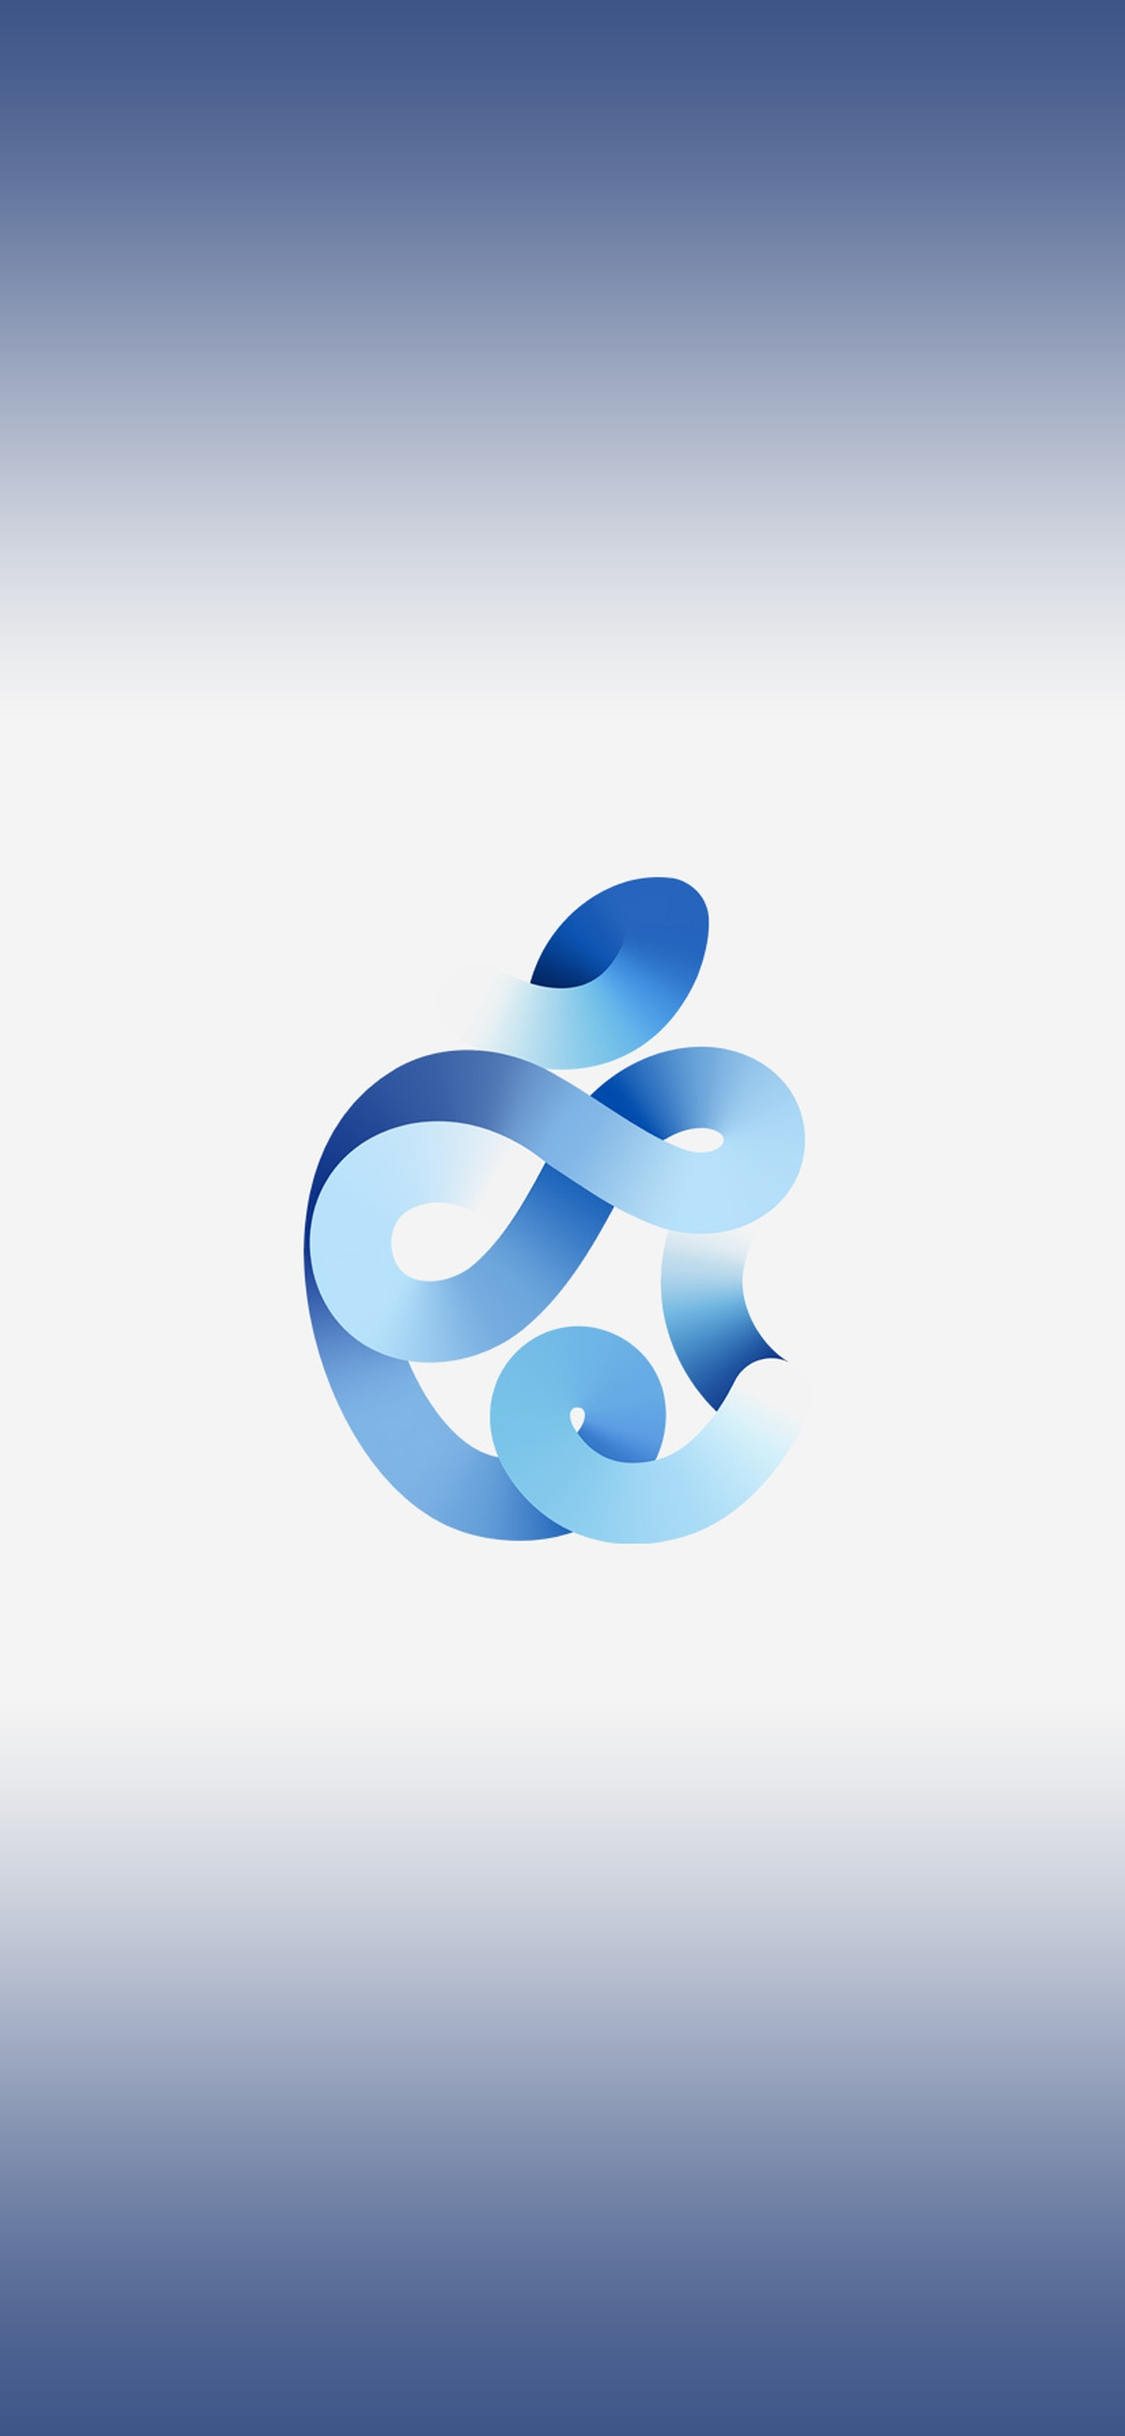 Apple September 15 event time flies iphone wallpaper saleemusama idownloadblog blue logo